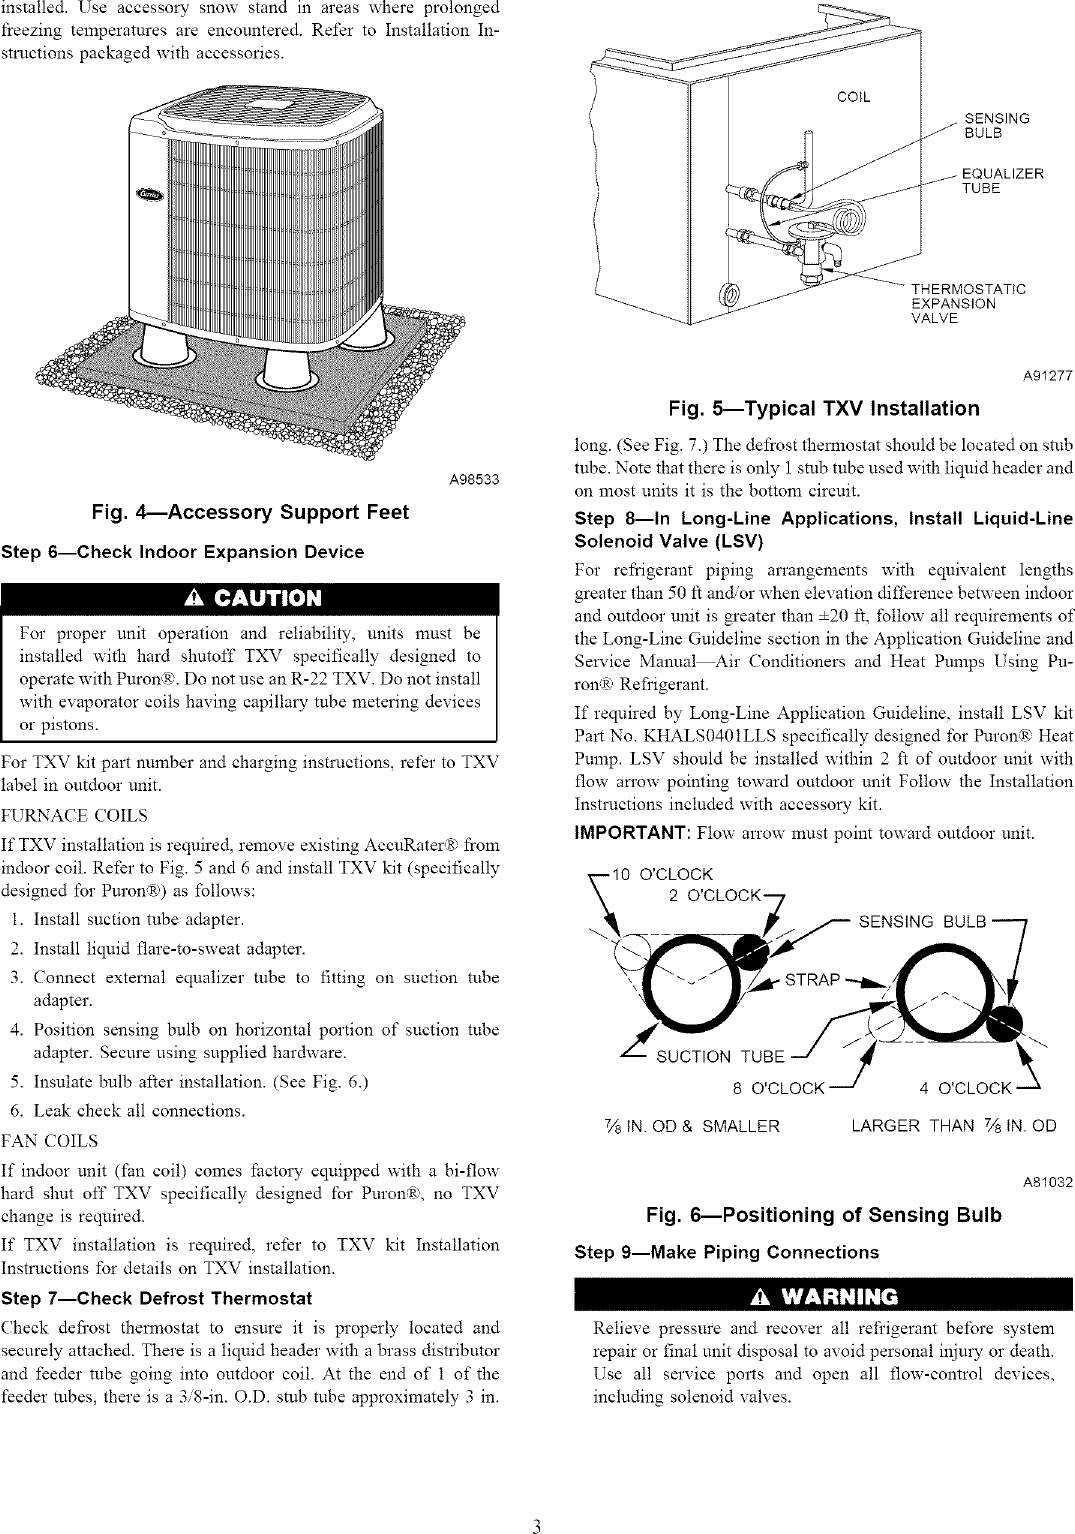 enerflow heat pump user manual